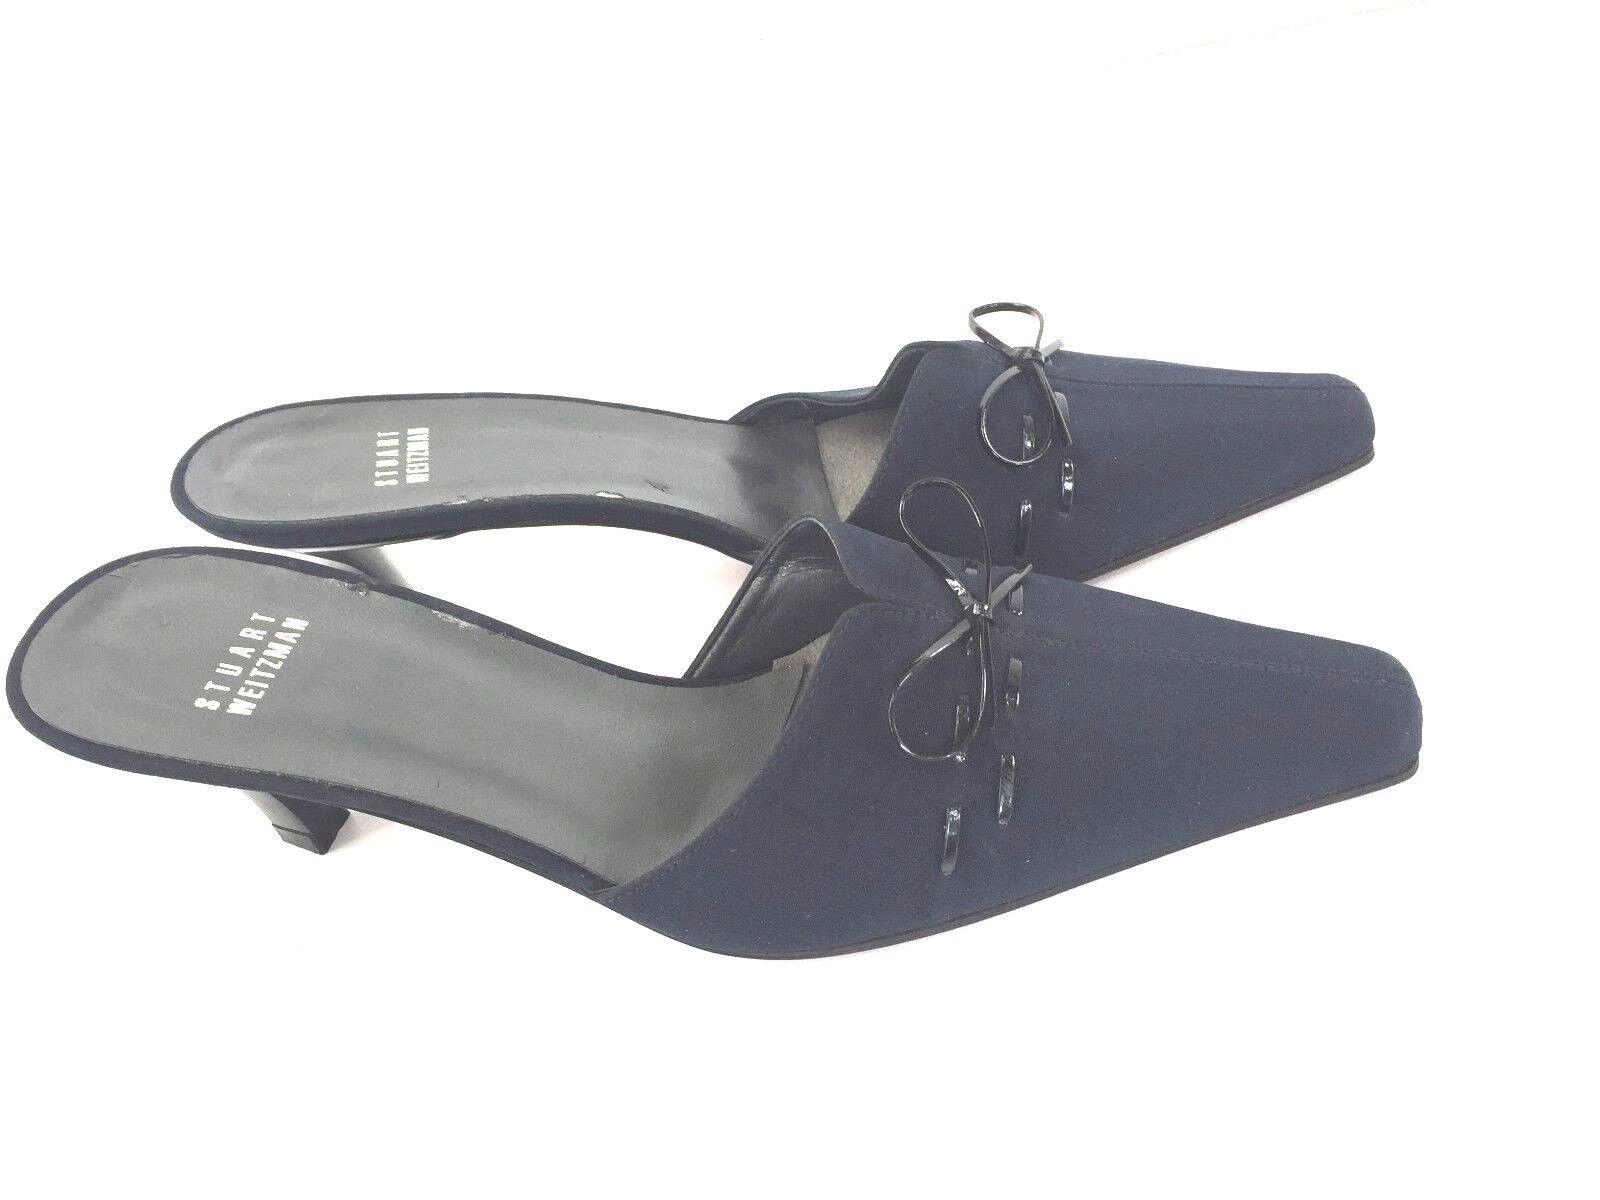 Stuwart Weitzman Shoes Heels Navy Blue Black Slip On Patent Bow Women's 7.5 M